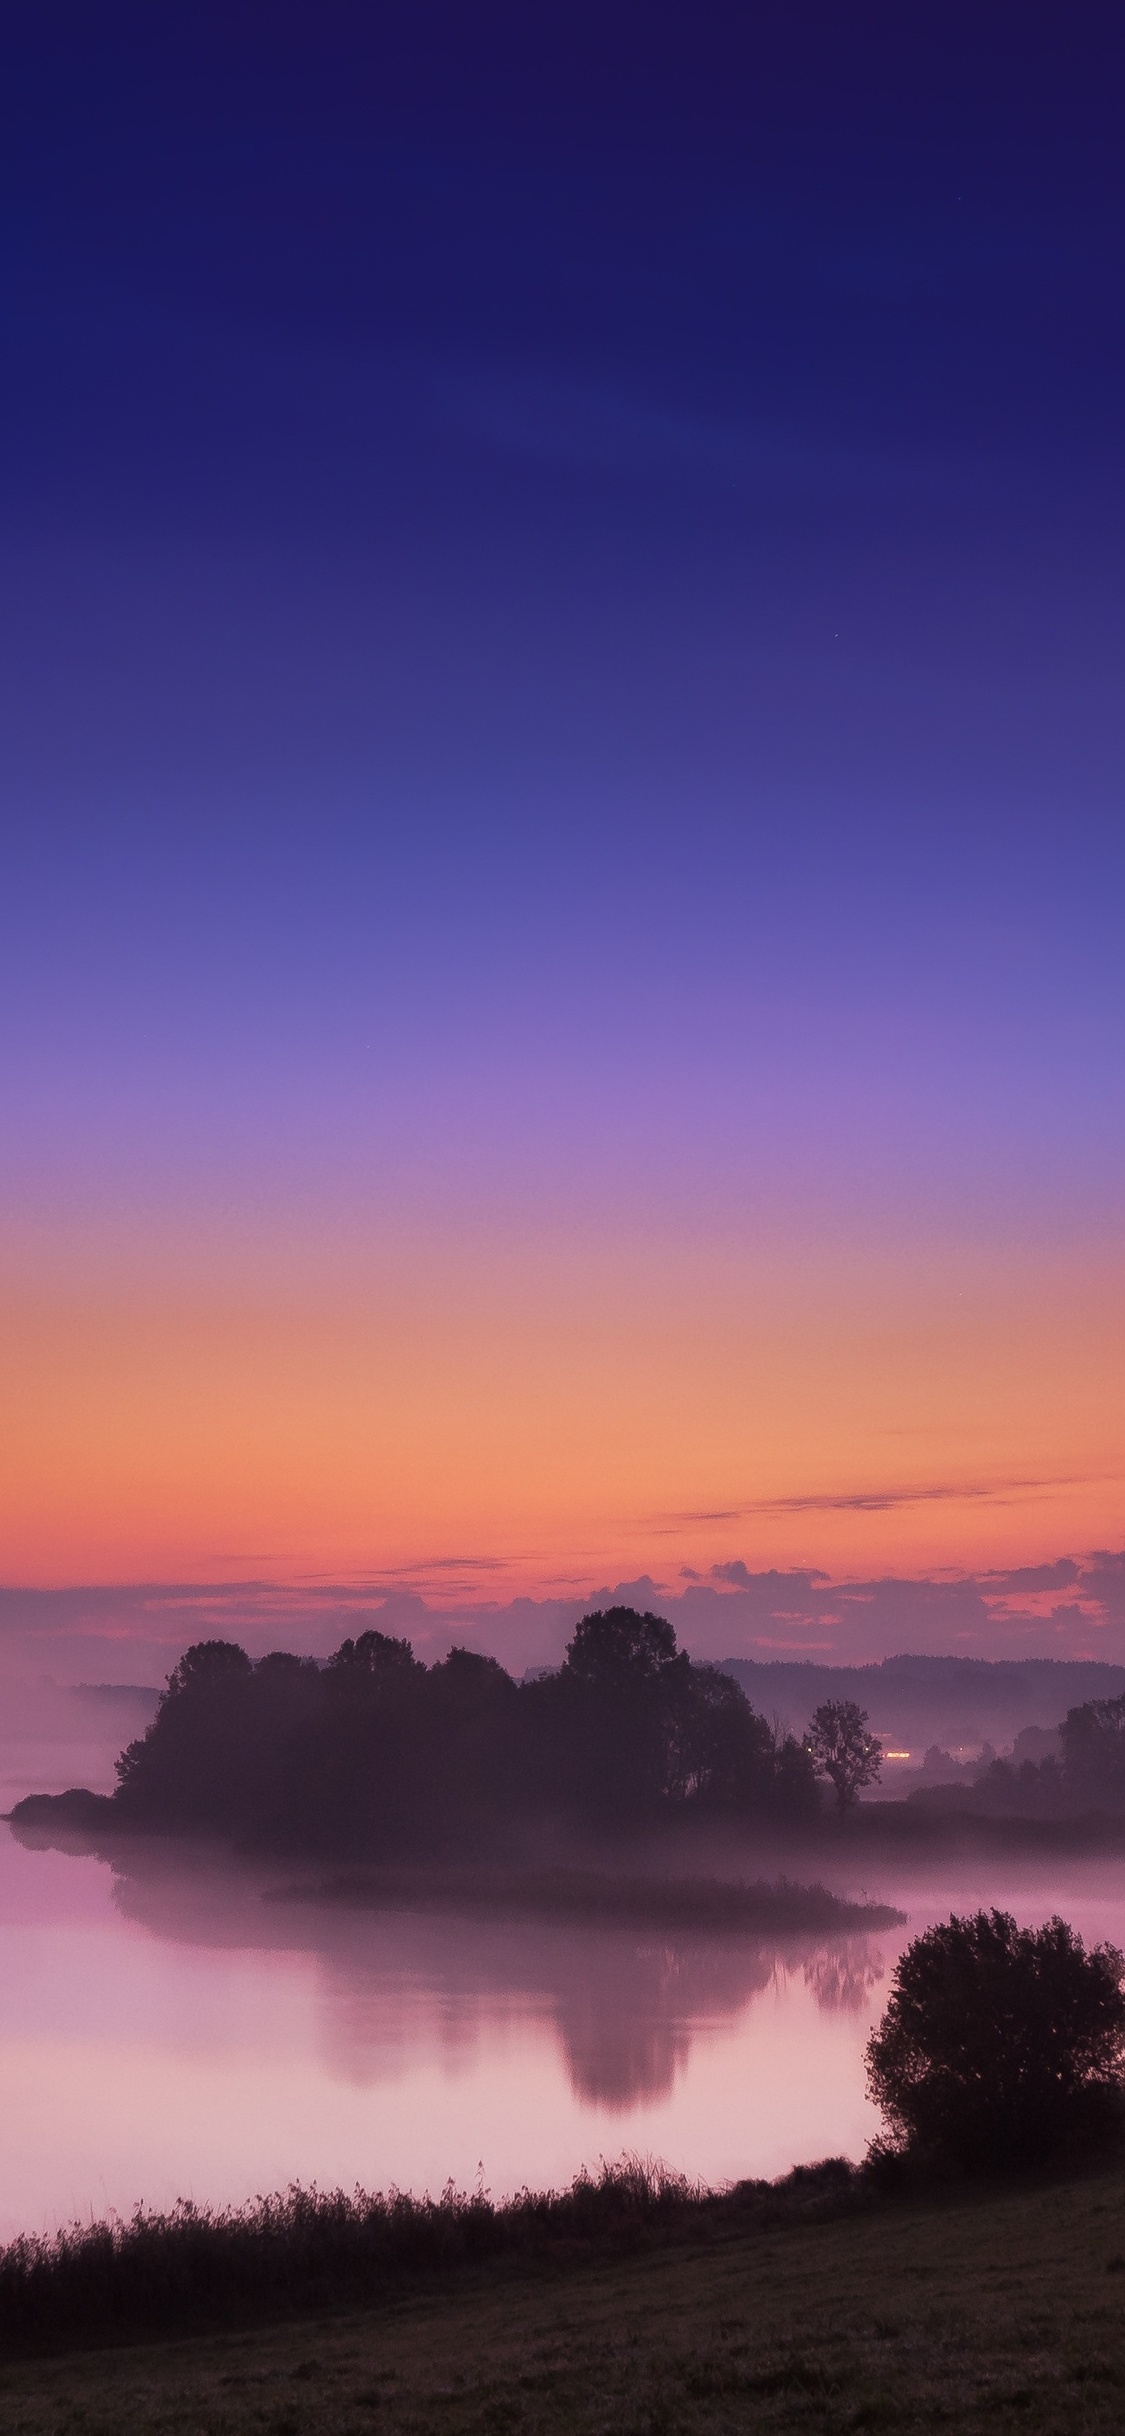 1125x2436 morning twilight iphone xs iphone 10 iphone x hd - Twilight wallpaper for iphone ...